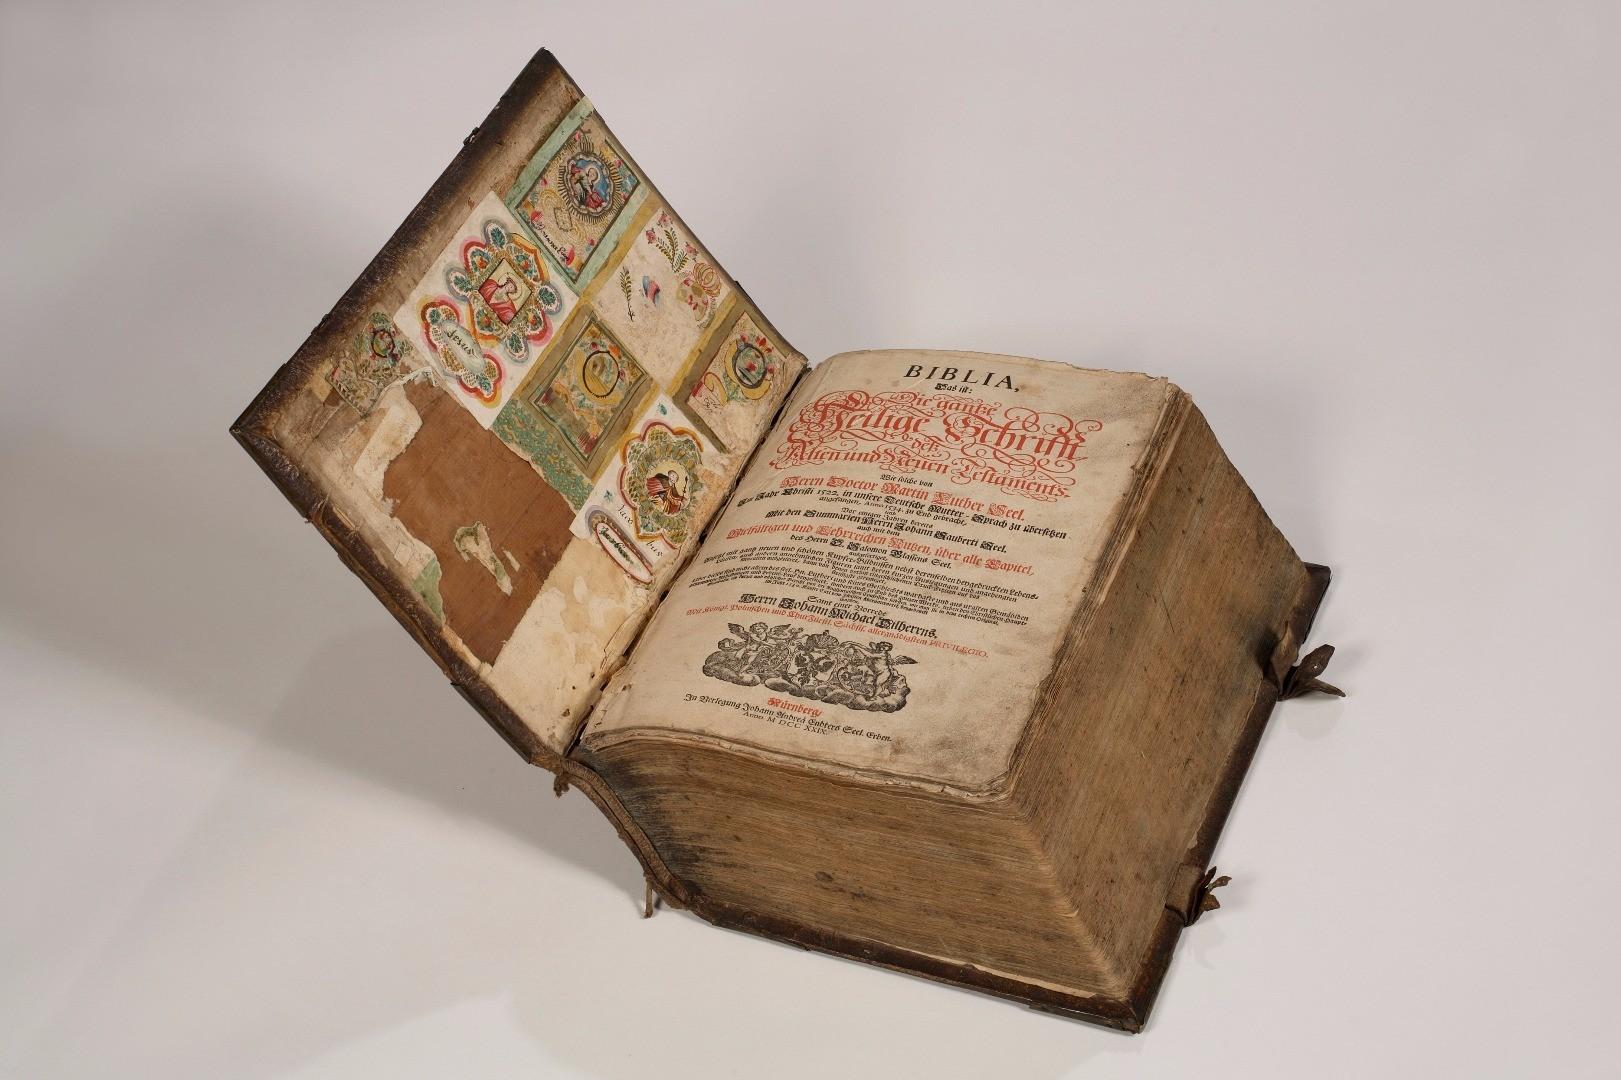 Bild 1 Lutherbibel 1729.jpg